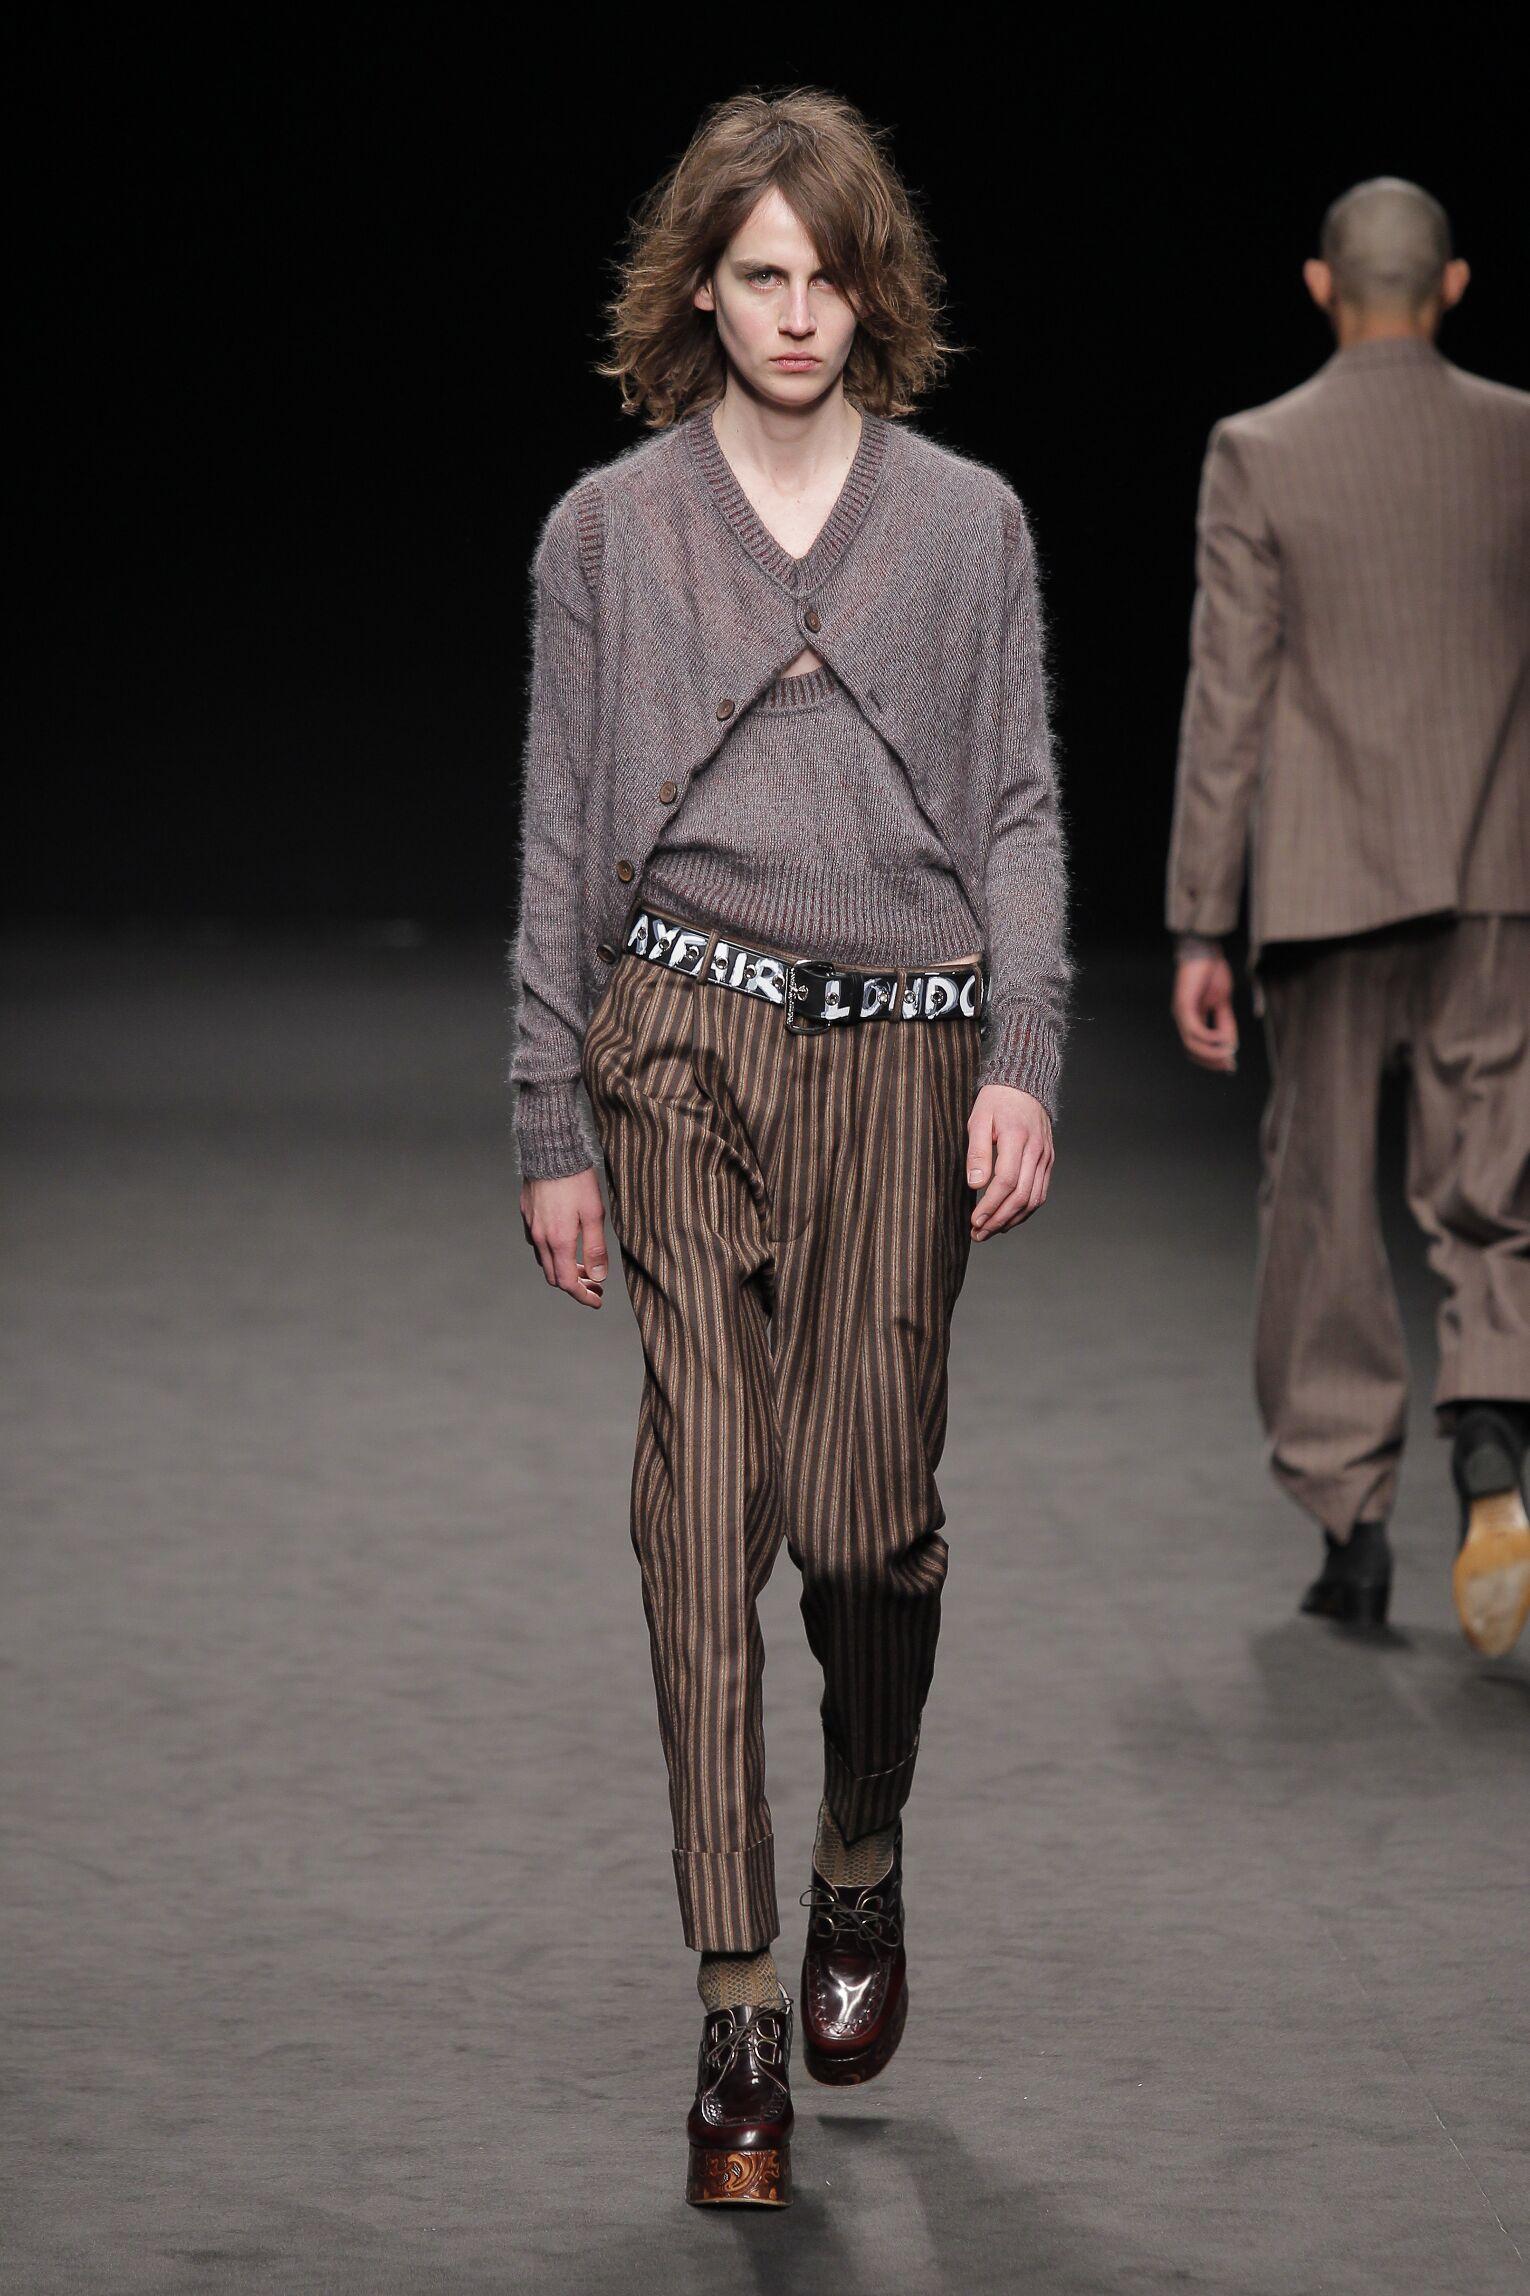 FW 2016 Vivienne Westwood Fashion Show